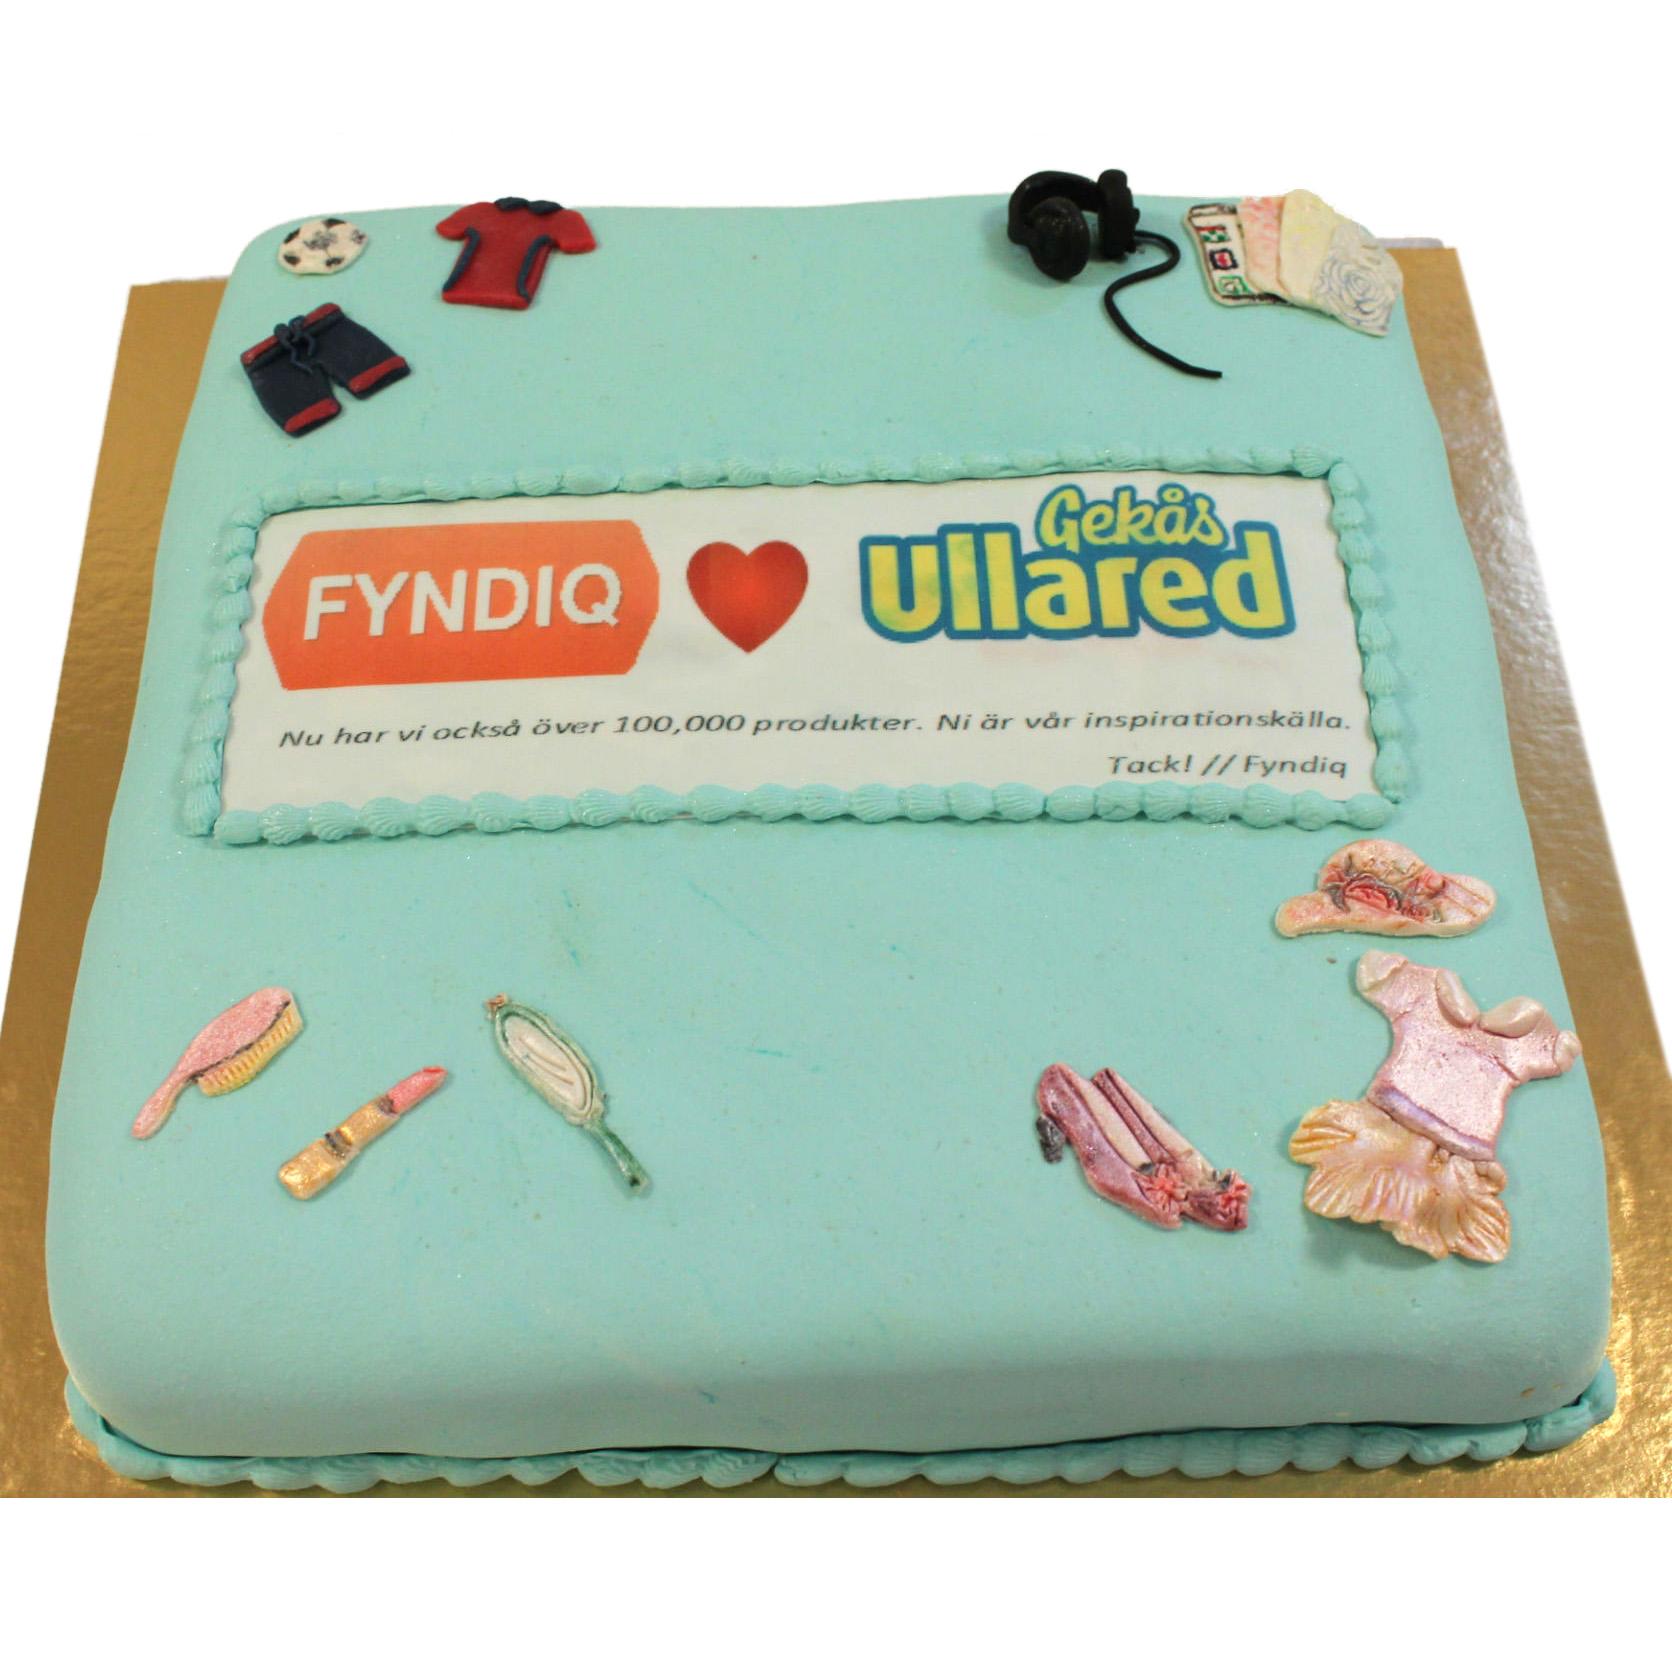 Fyndiq bjuder på Tårta - når 100 000 produkter